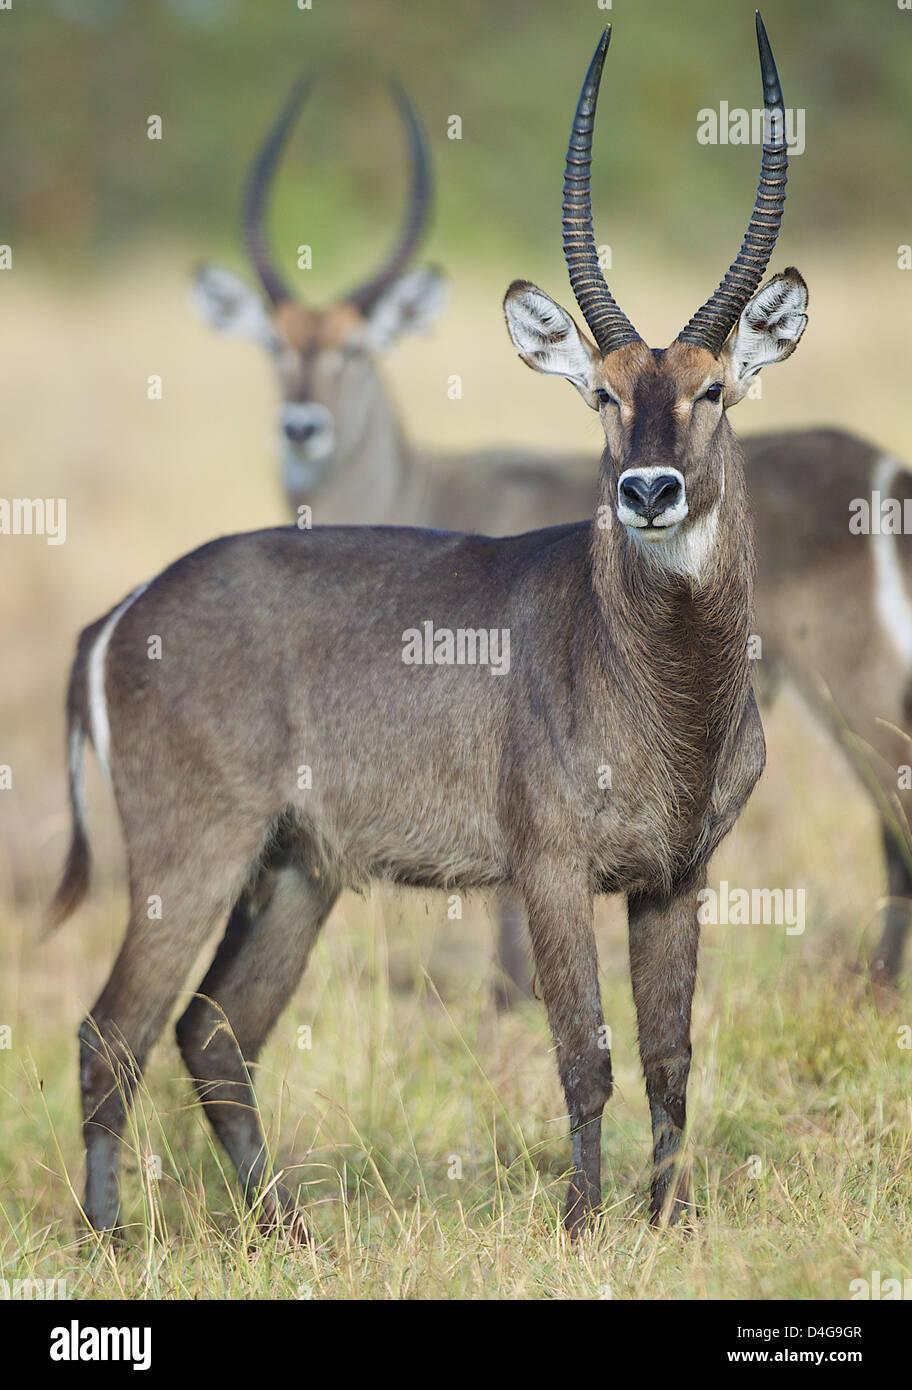 Kobus ellipsiprymnus Saadani macho antelope National Park Tanzania Africa Imagen De Stock